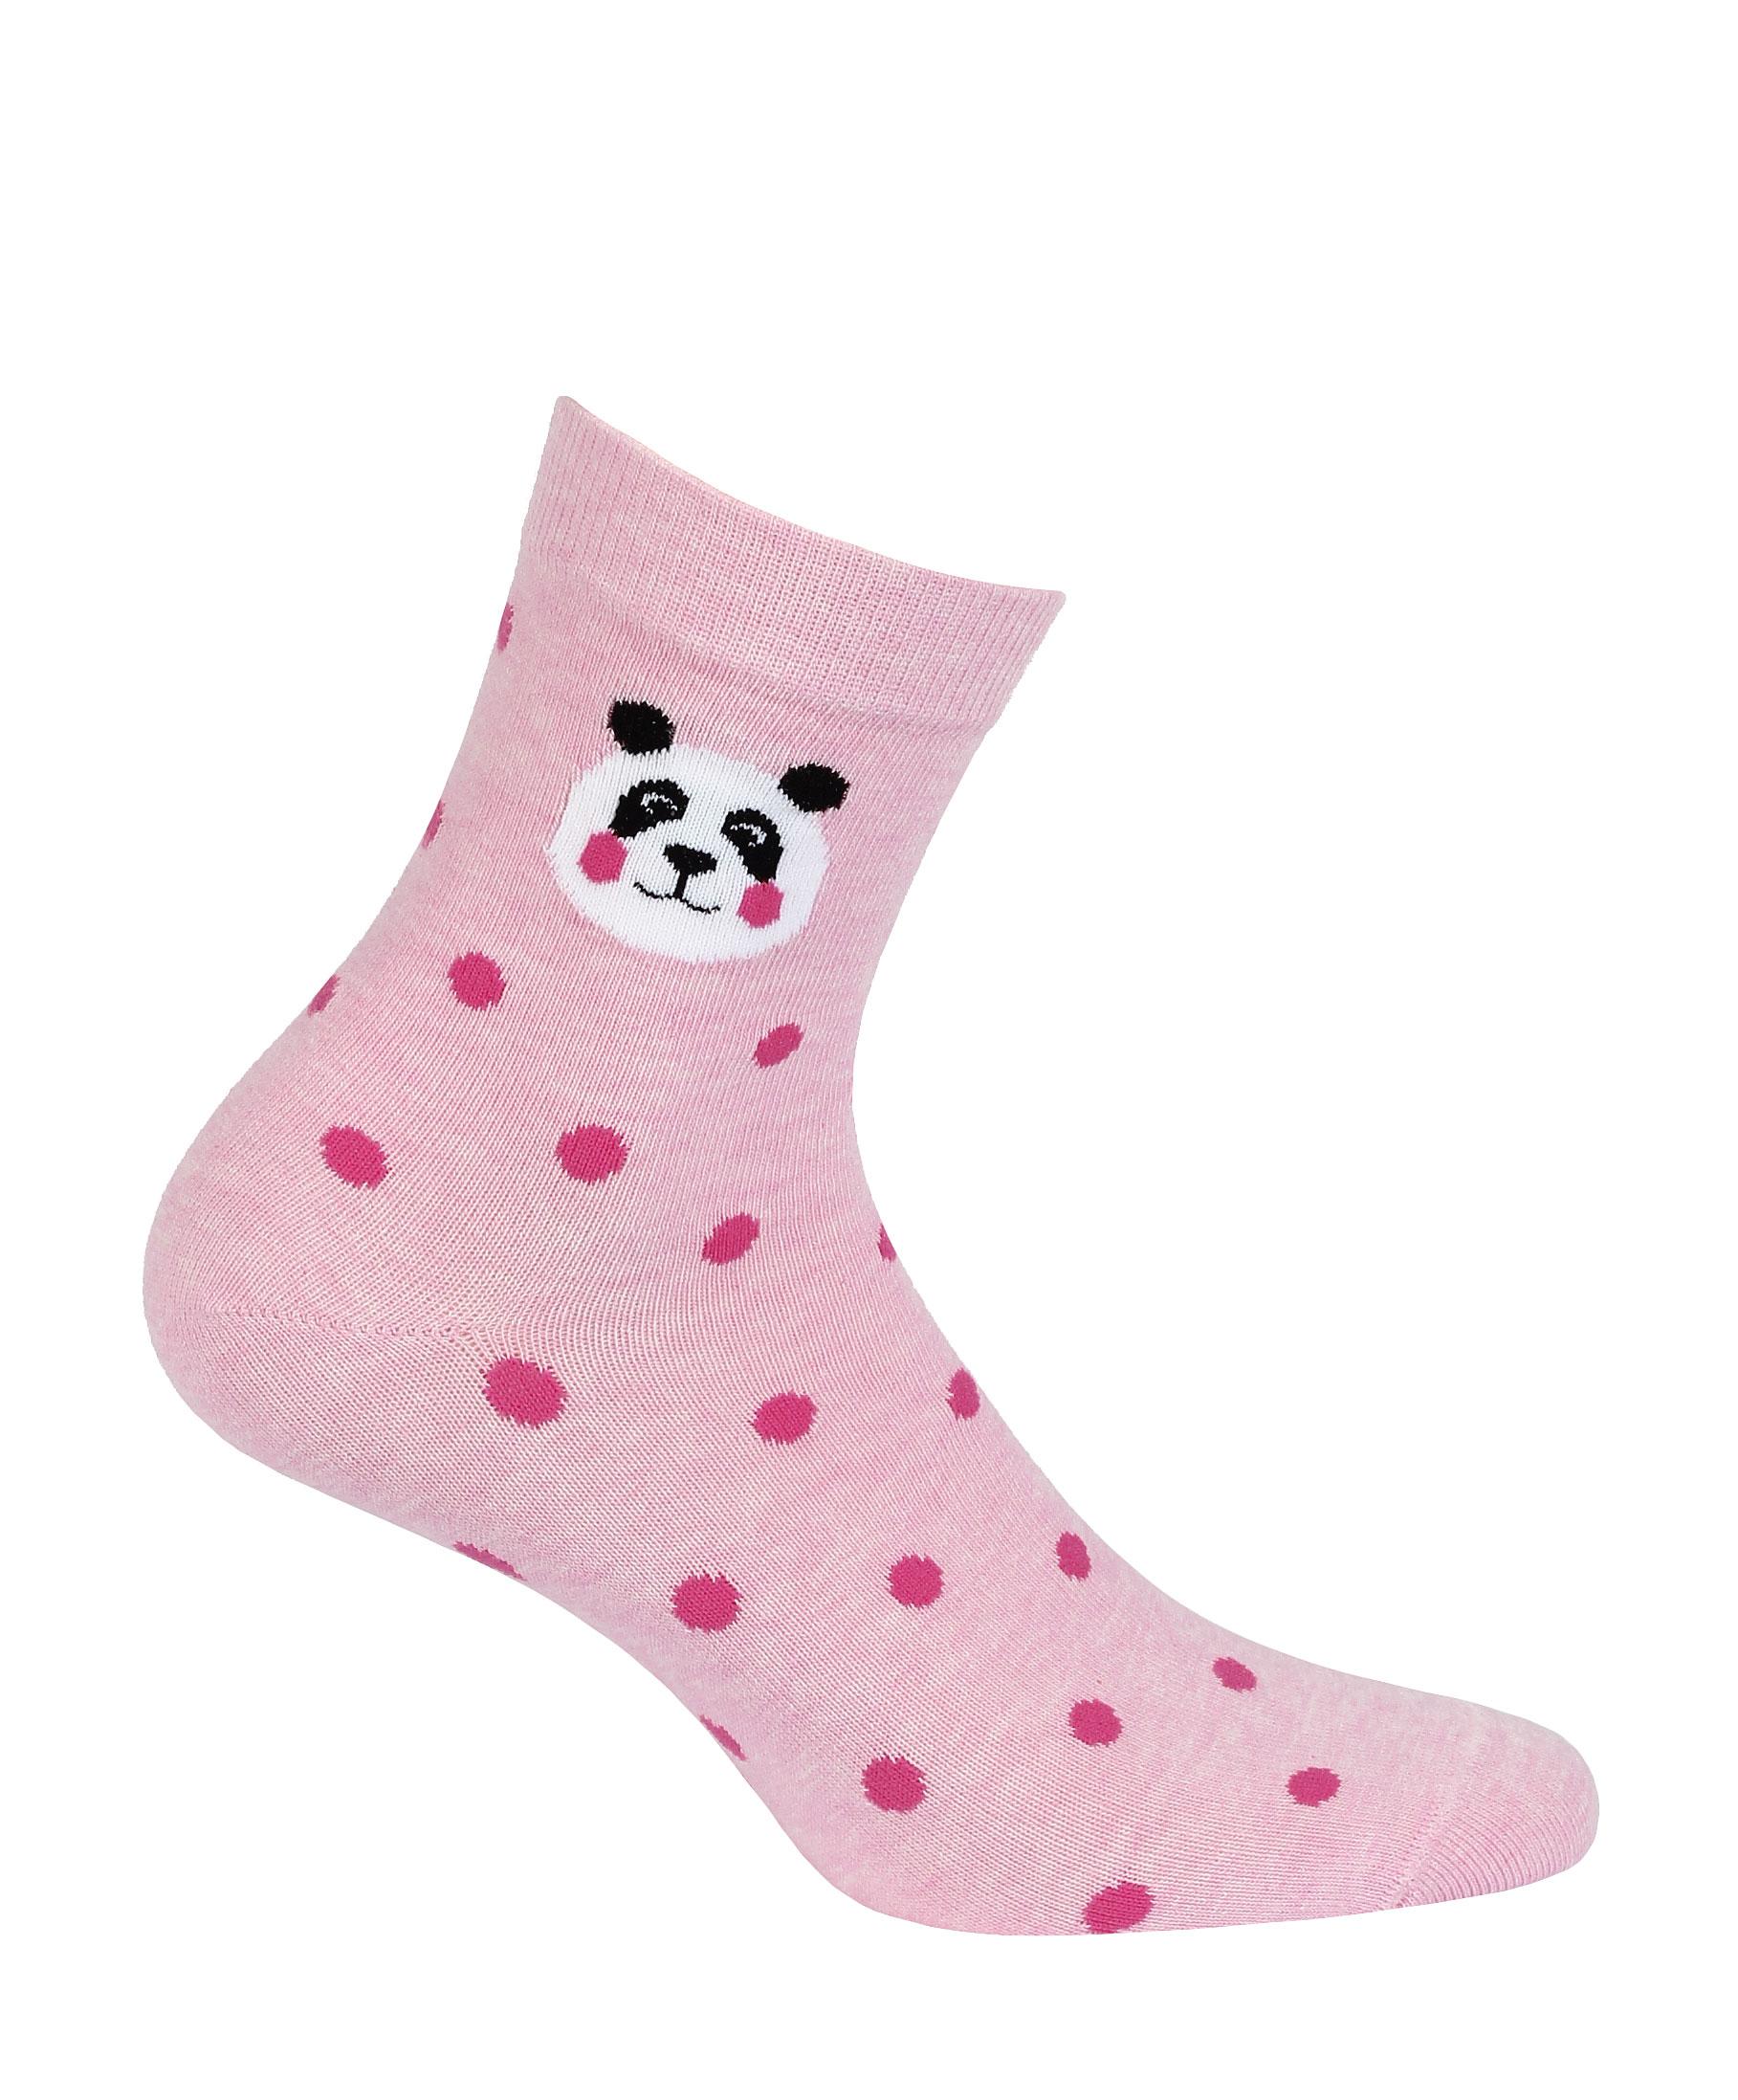 dětské ponožky vzor GATTA PANDA, PUNTÍKY růžové 33-35